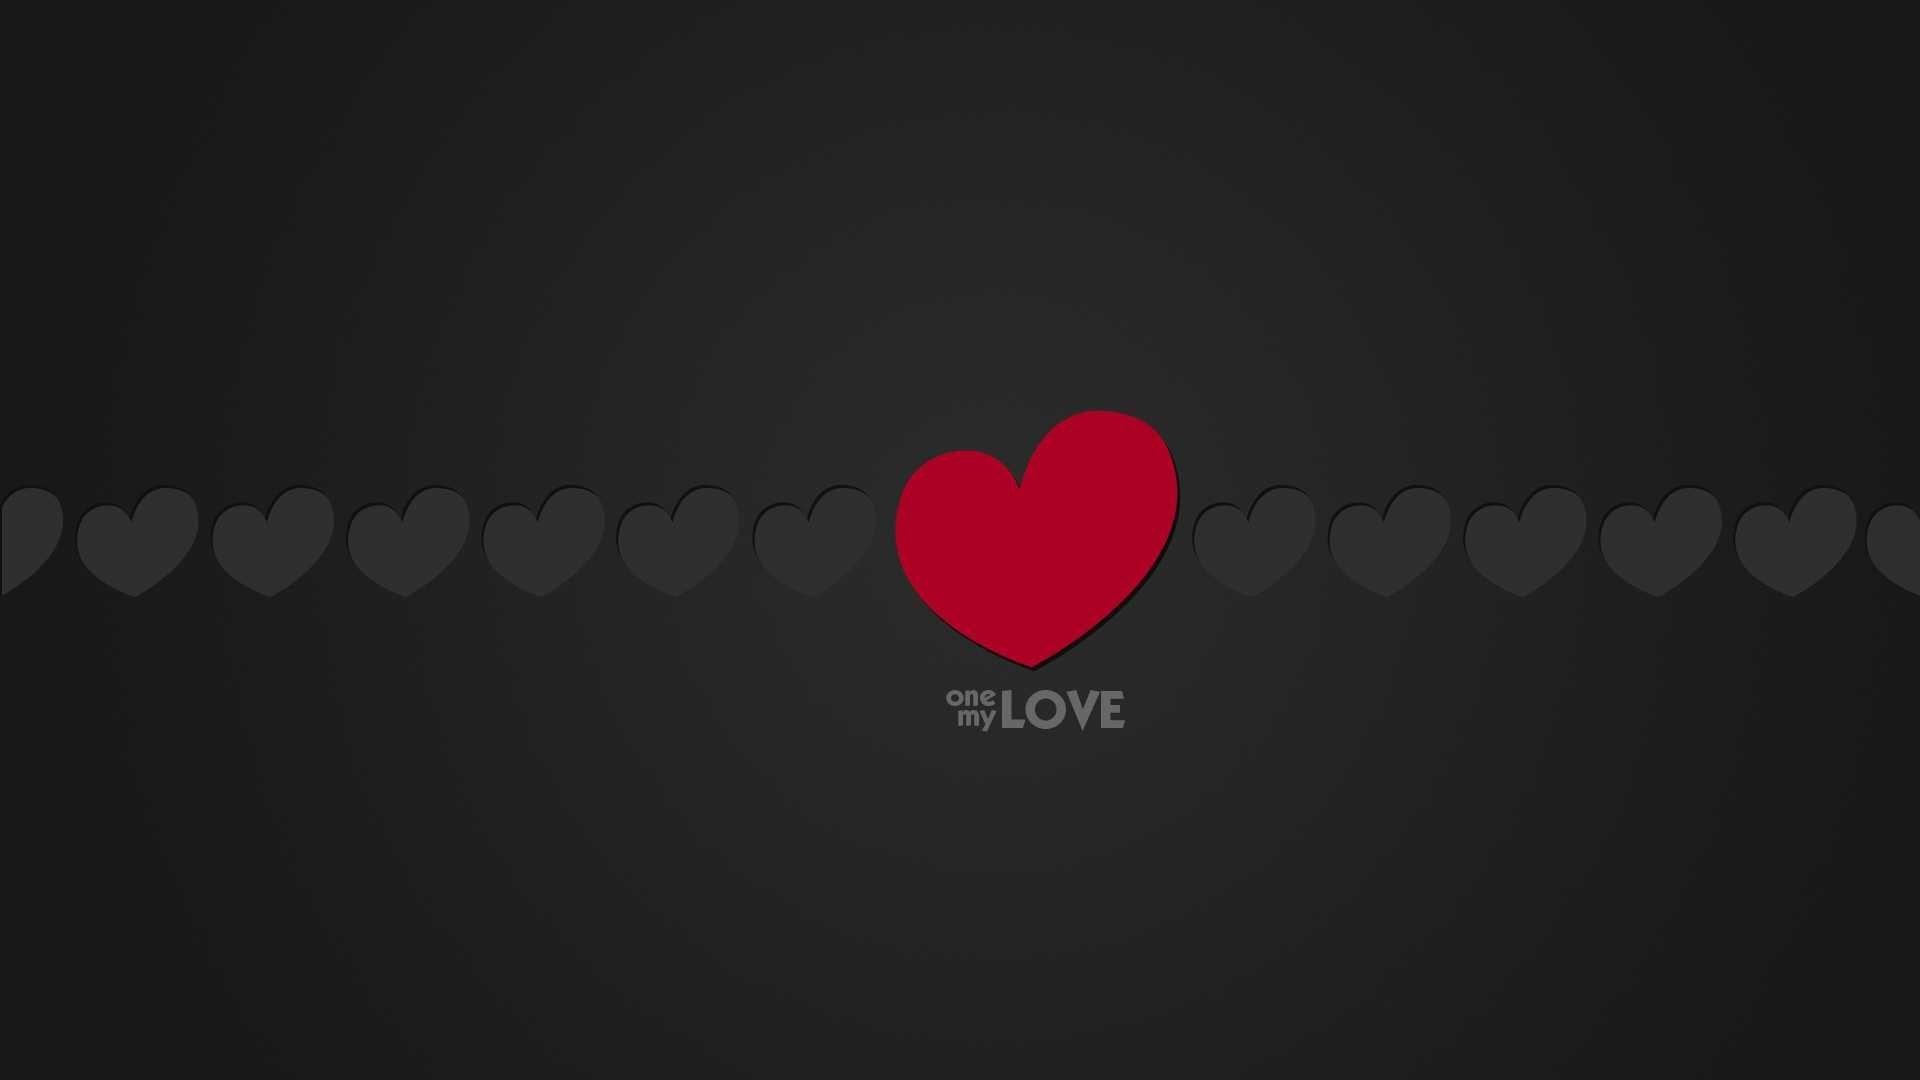 Veda Aco Free Wallpaper Black Wallpaper Hd Heart